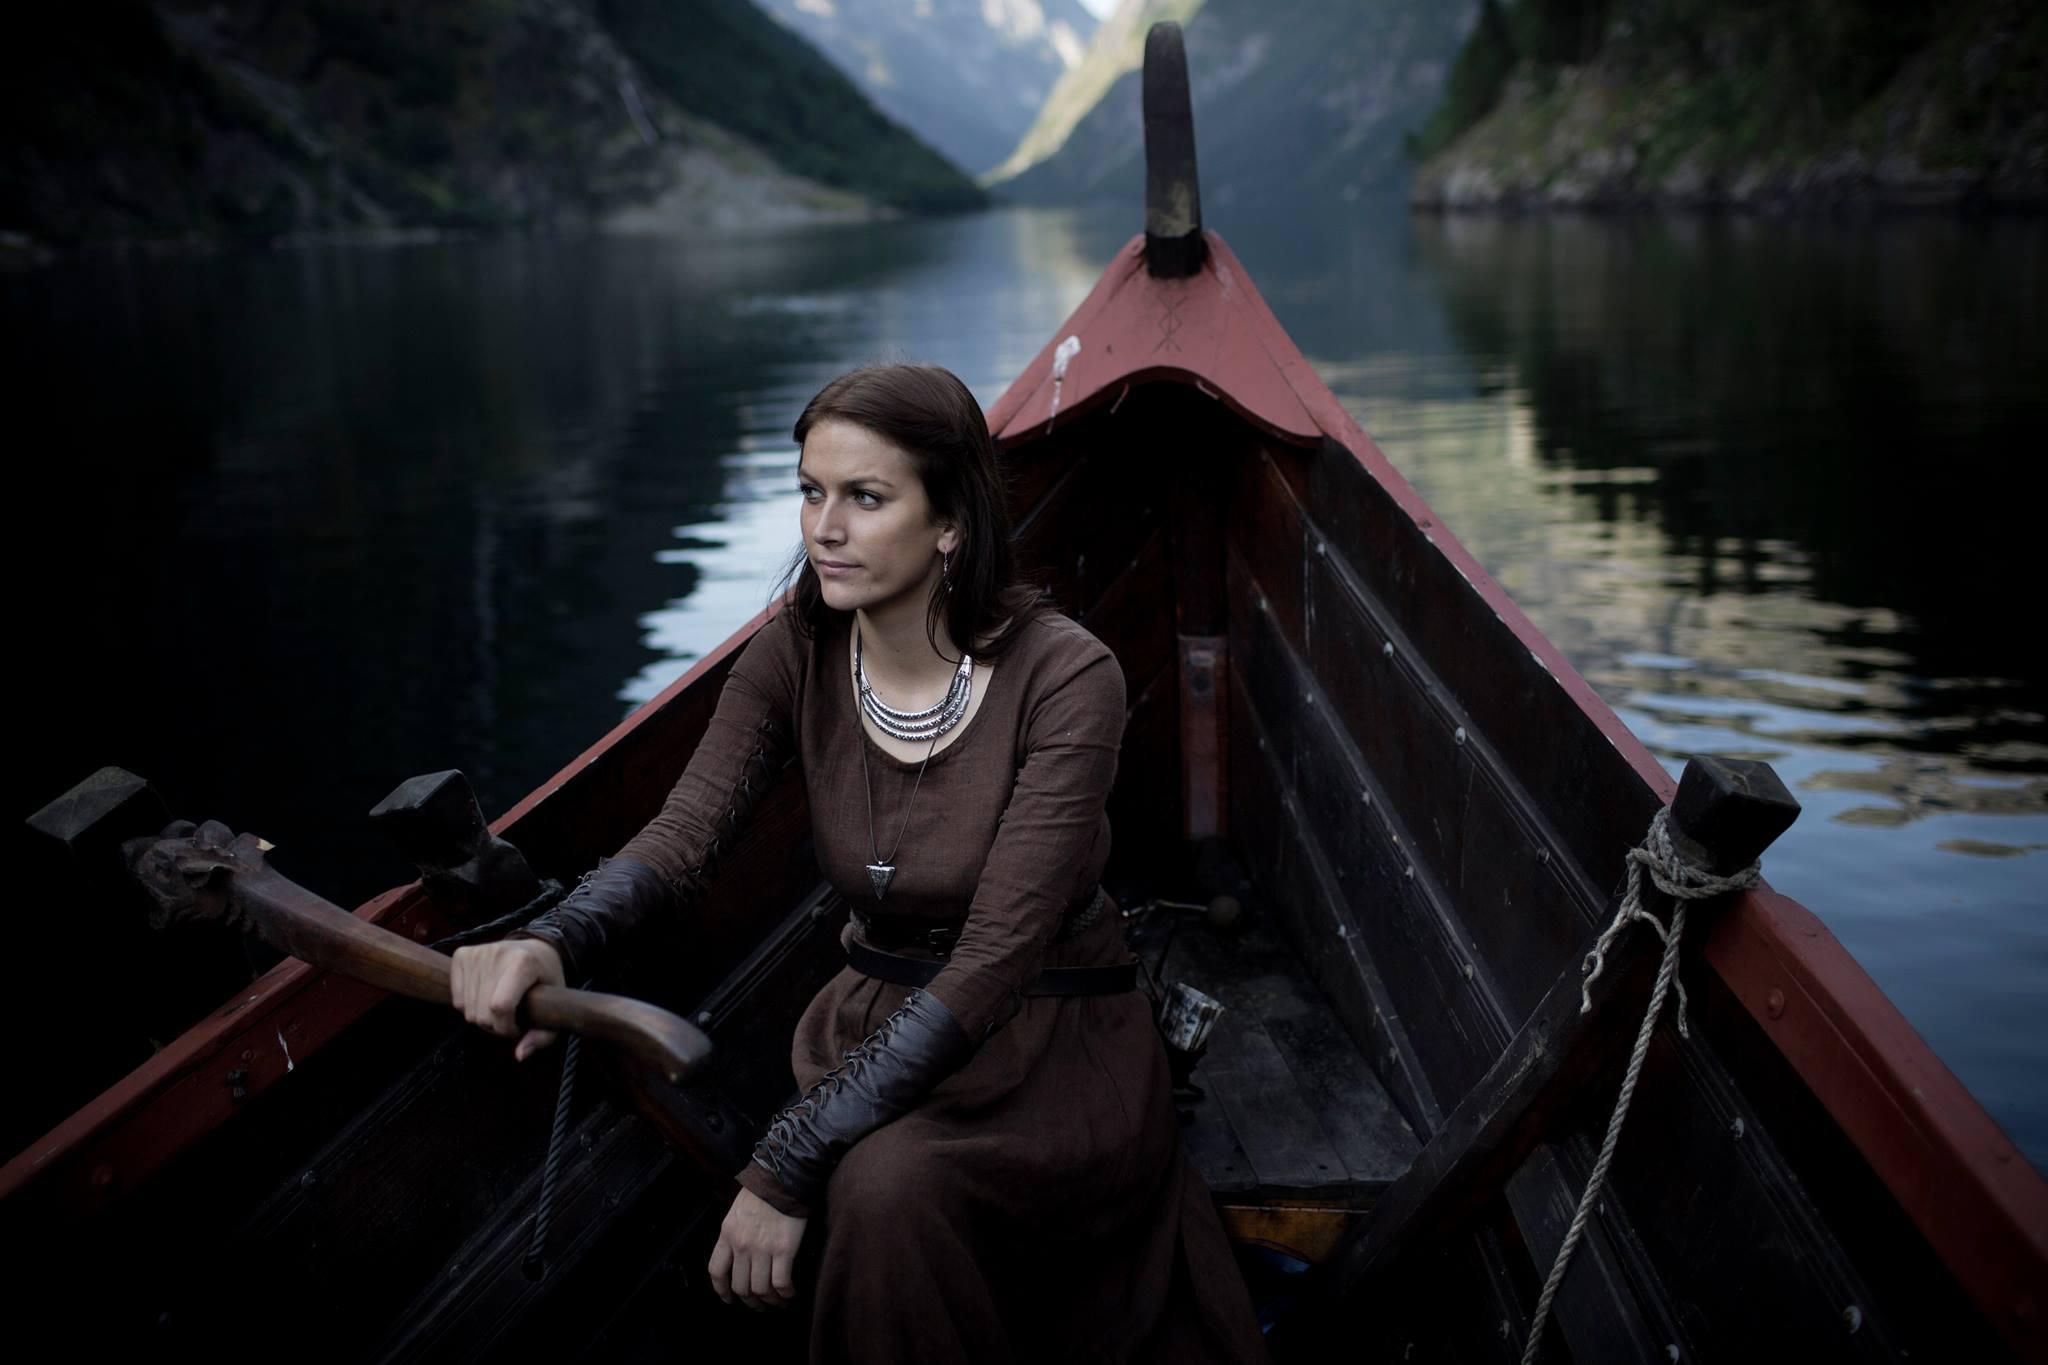 V. VIGDÍS SVEINSDÓTTIR - Norwegian academic, blogger (valkyrja.com), and Viking Age re-enactor. June—July 2016.